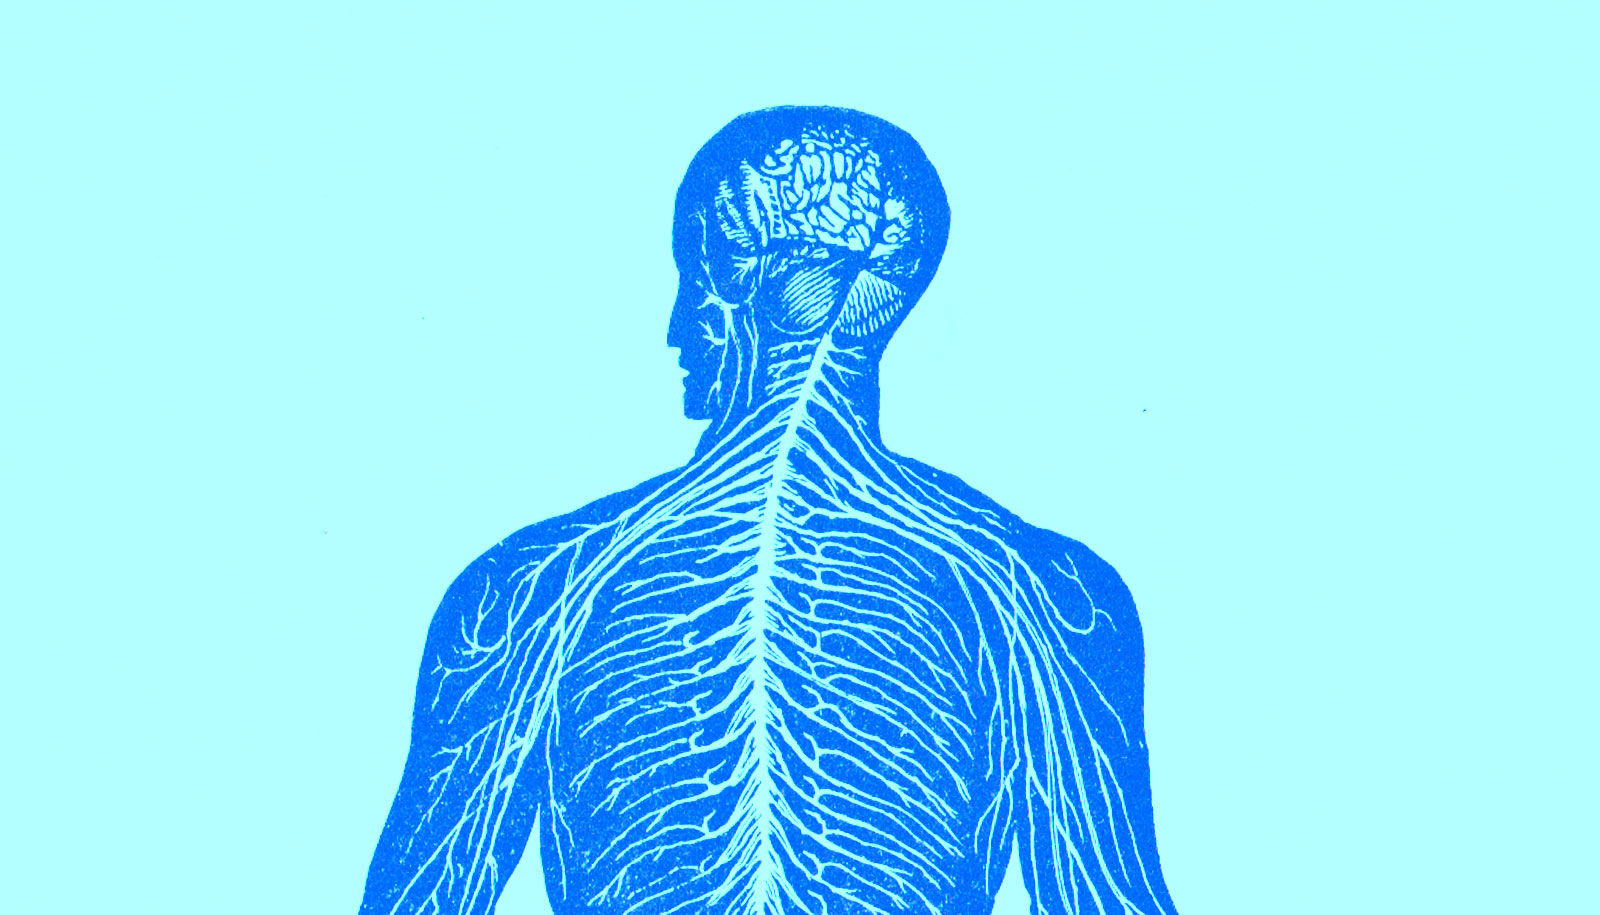 embryonic stem cells form useful proto-nervous system